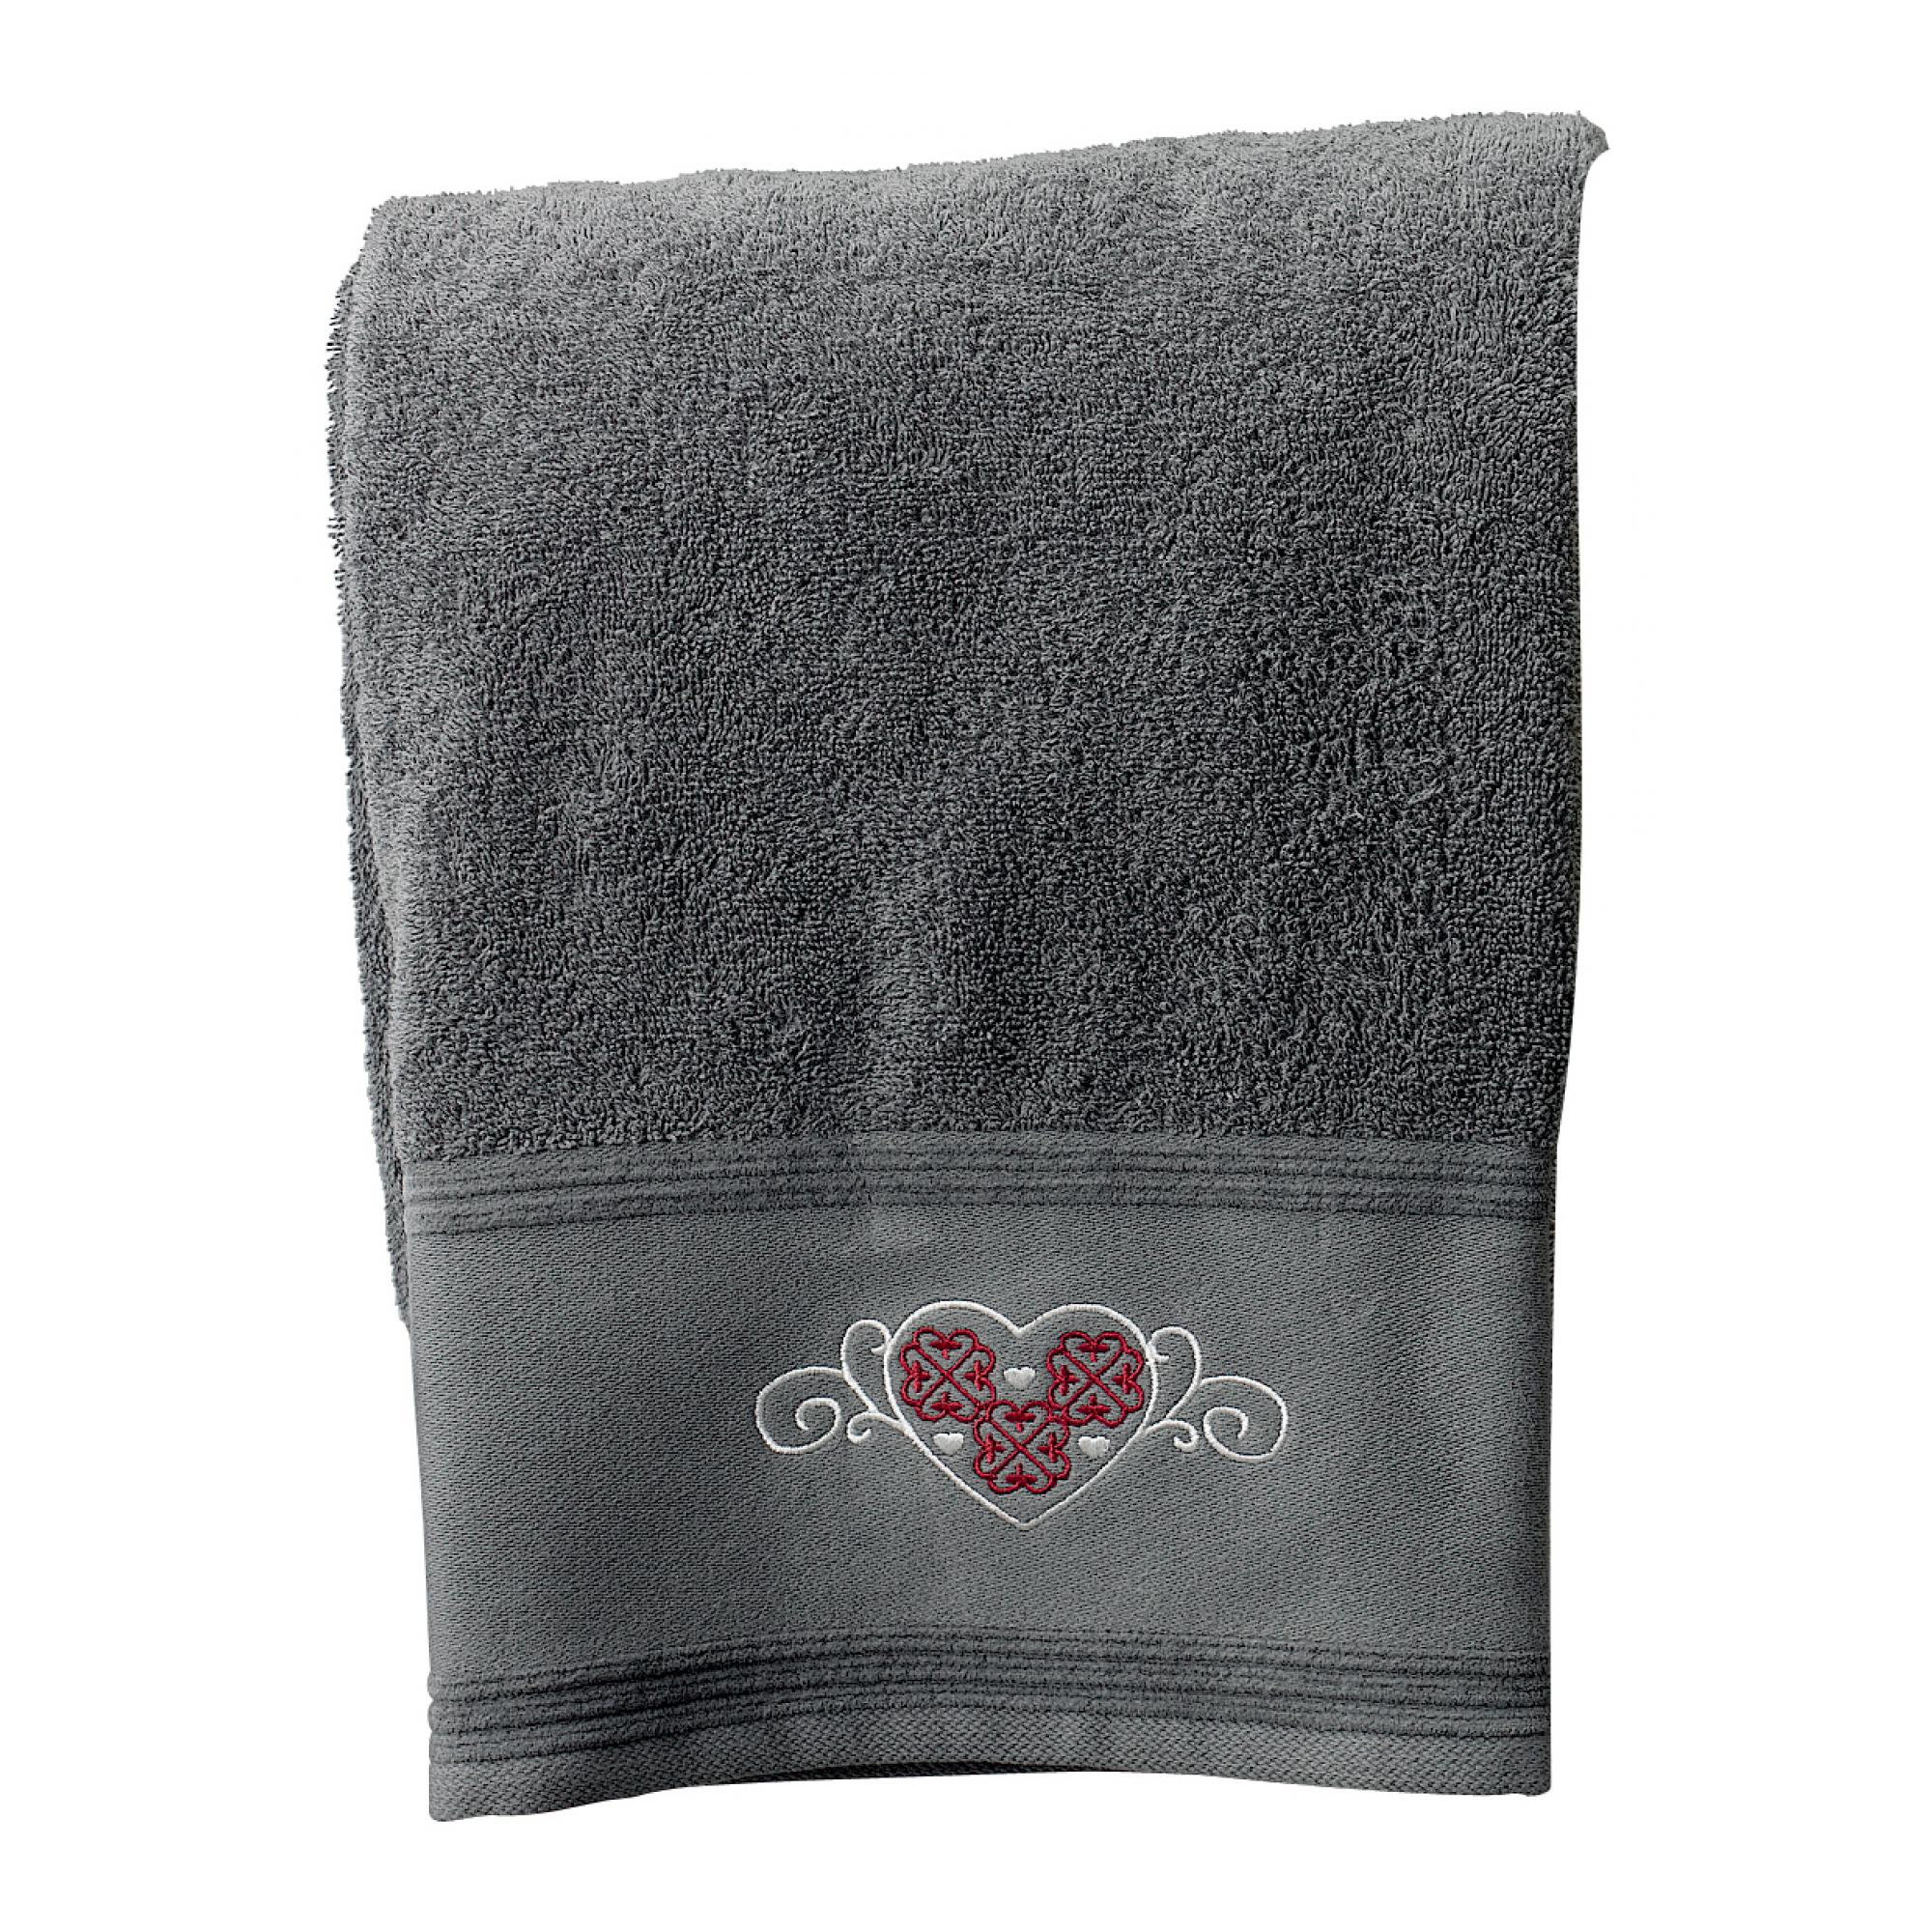 Drap de bain Cosy en coton ombre 80 x 150